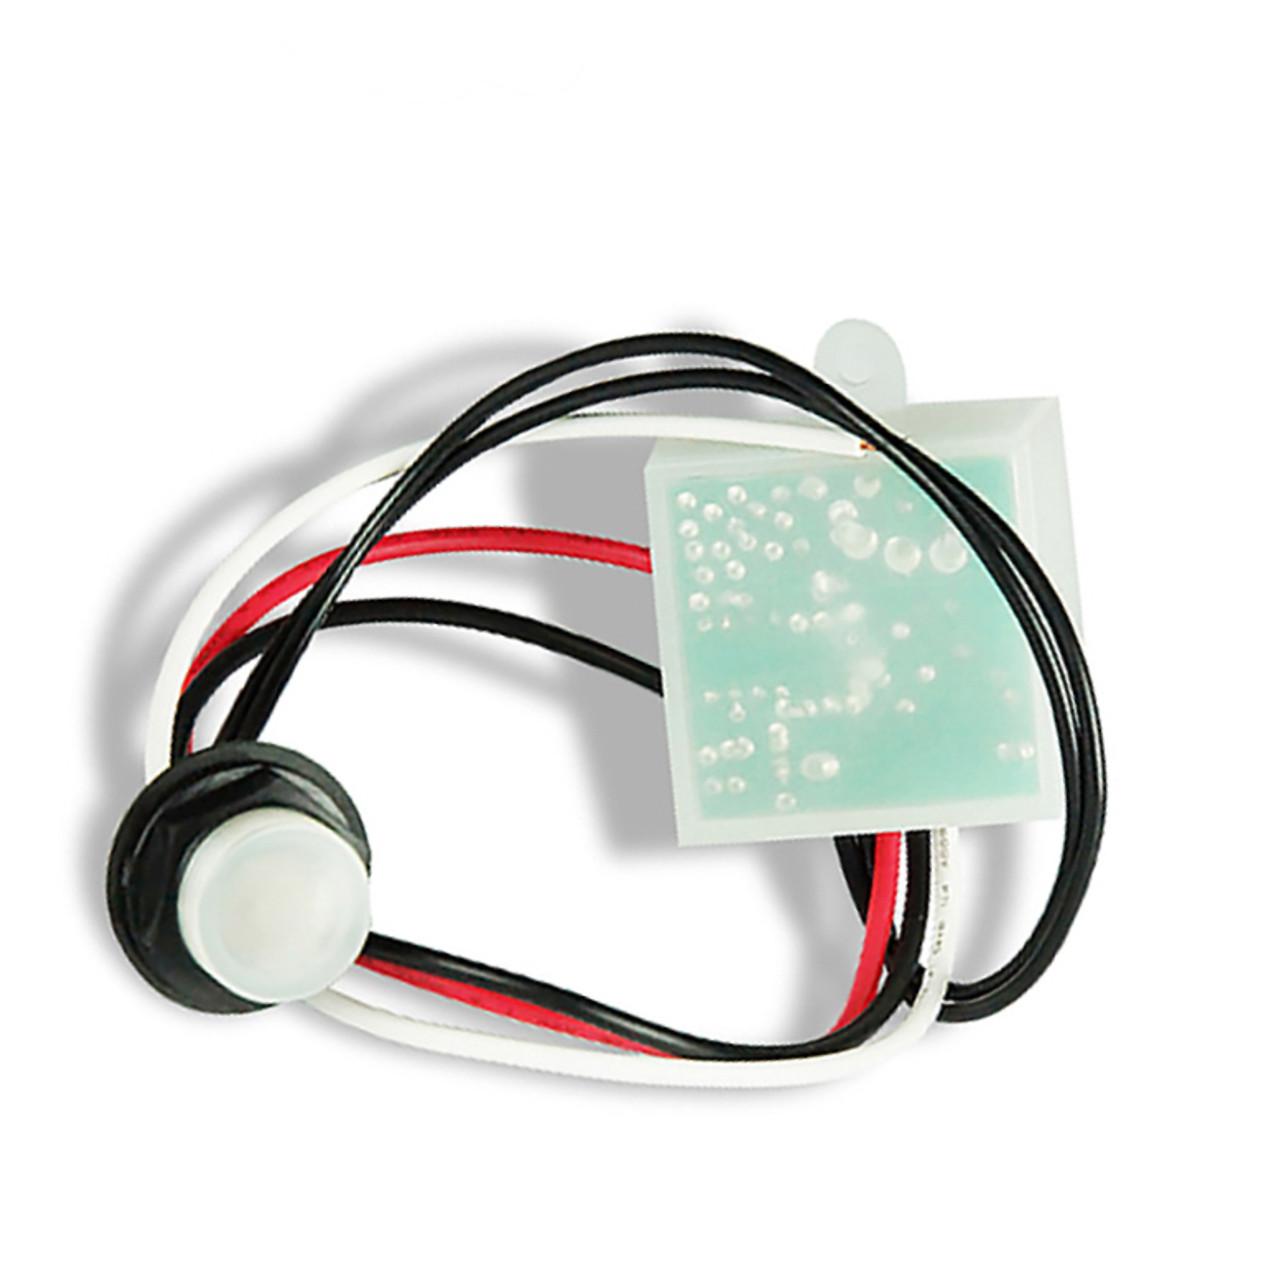 12V Photocell Dusk-to-Dawn Sensor Switch Photocell PhotocontrolMarinebeam